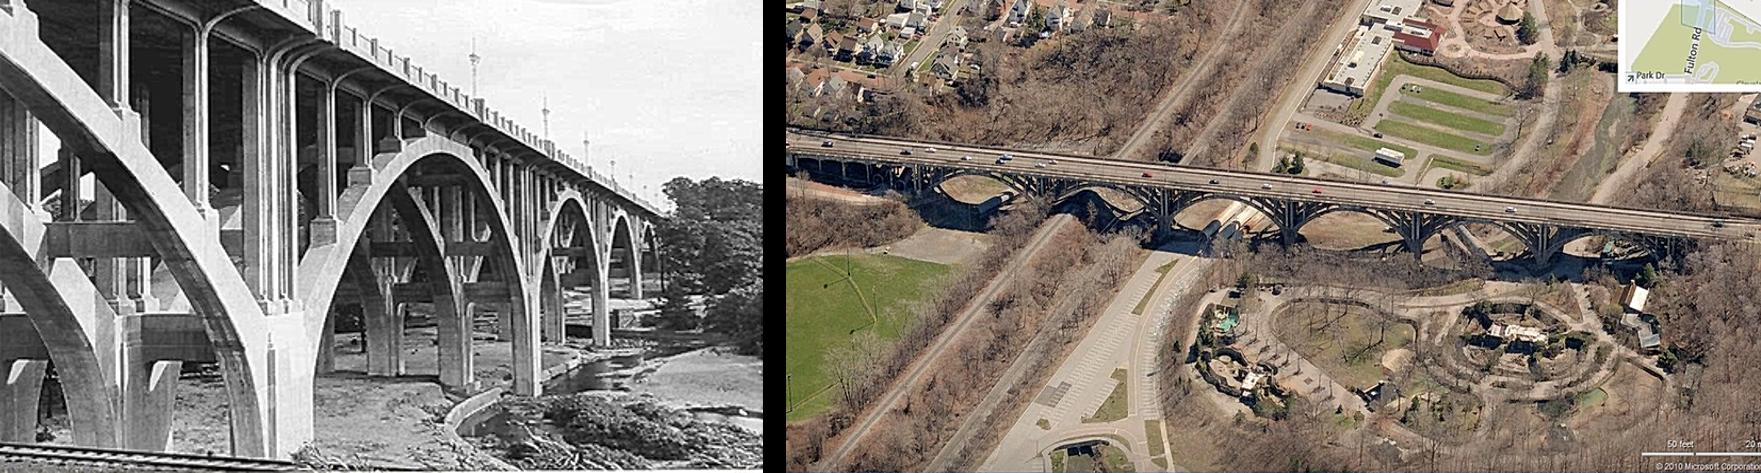 Left: The original Fulton Street Bridge structure (now demolished). Right: Aerial view of the new Fulton Street Bridge.